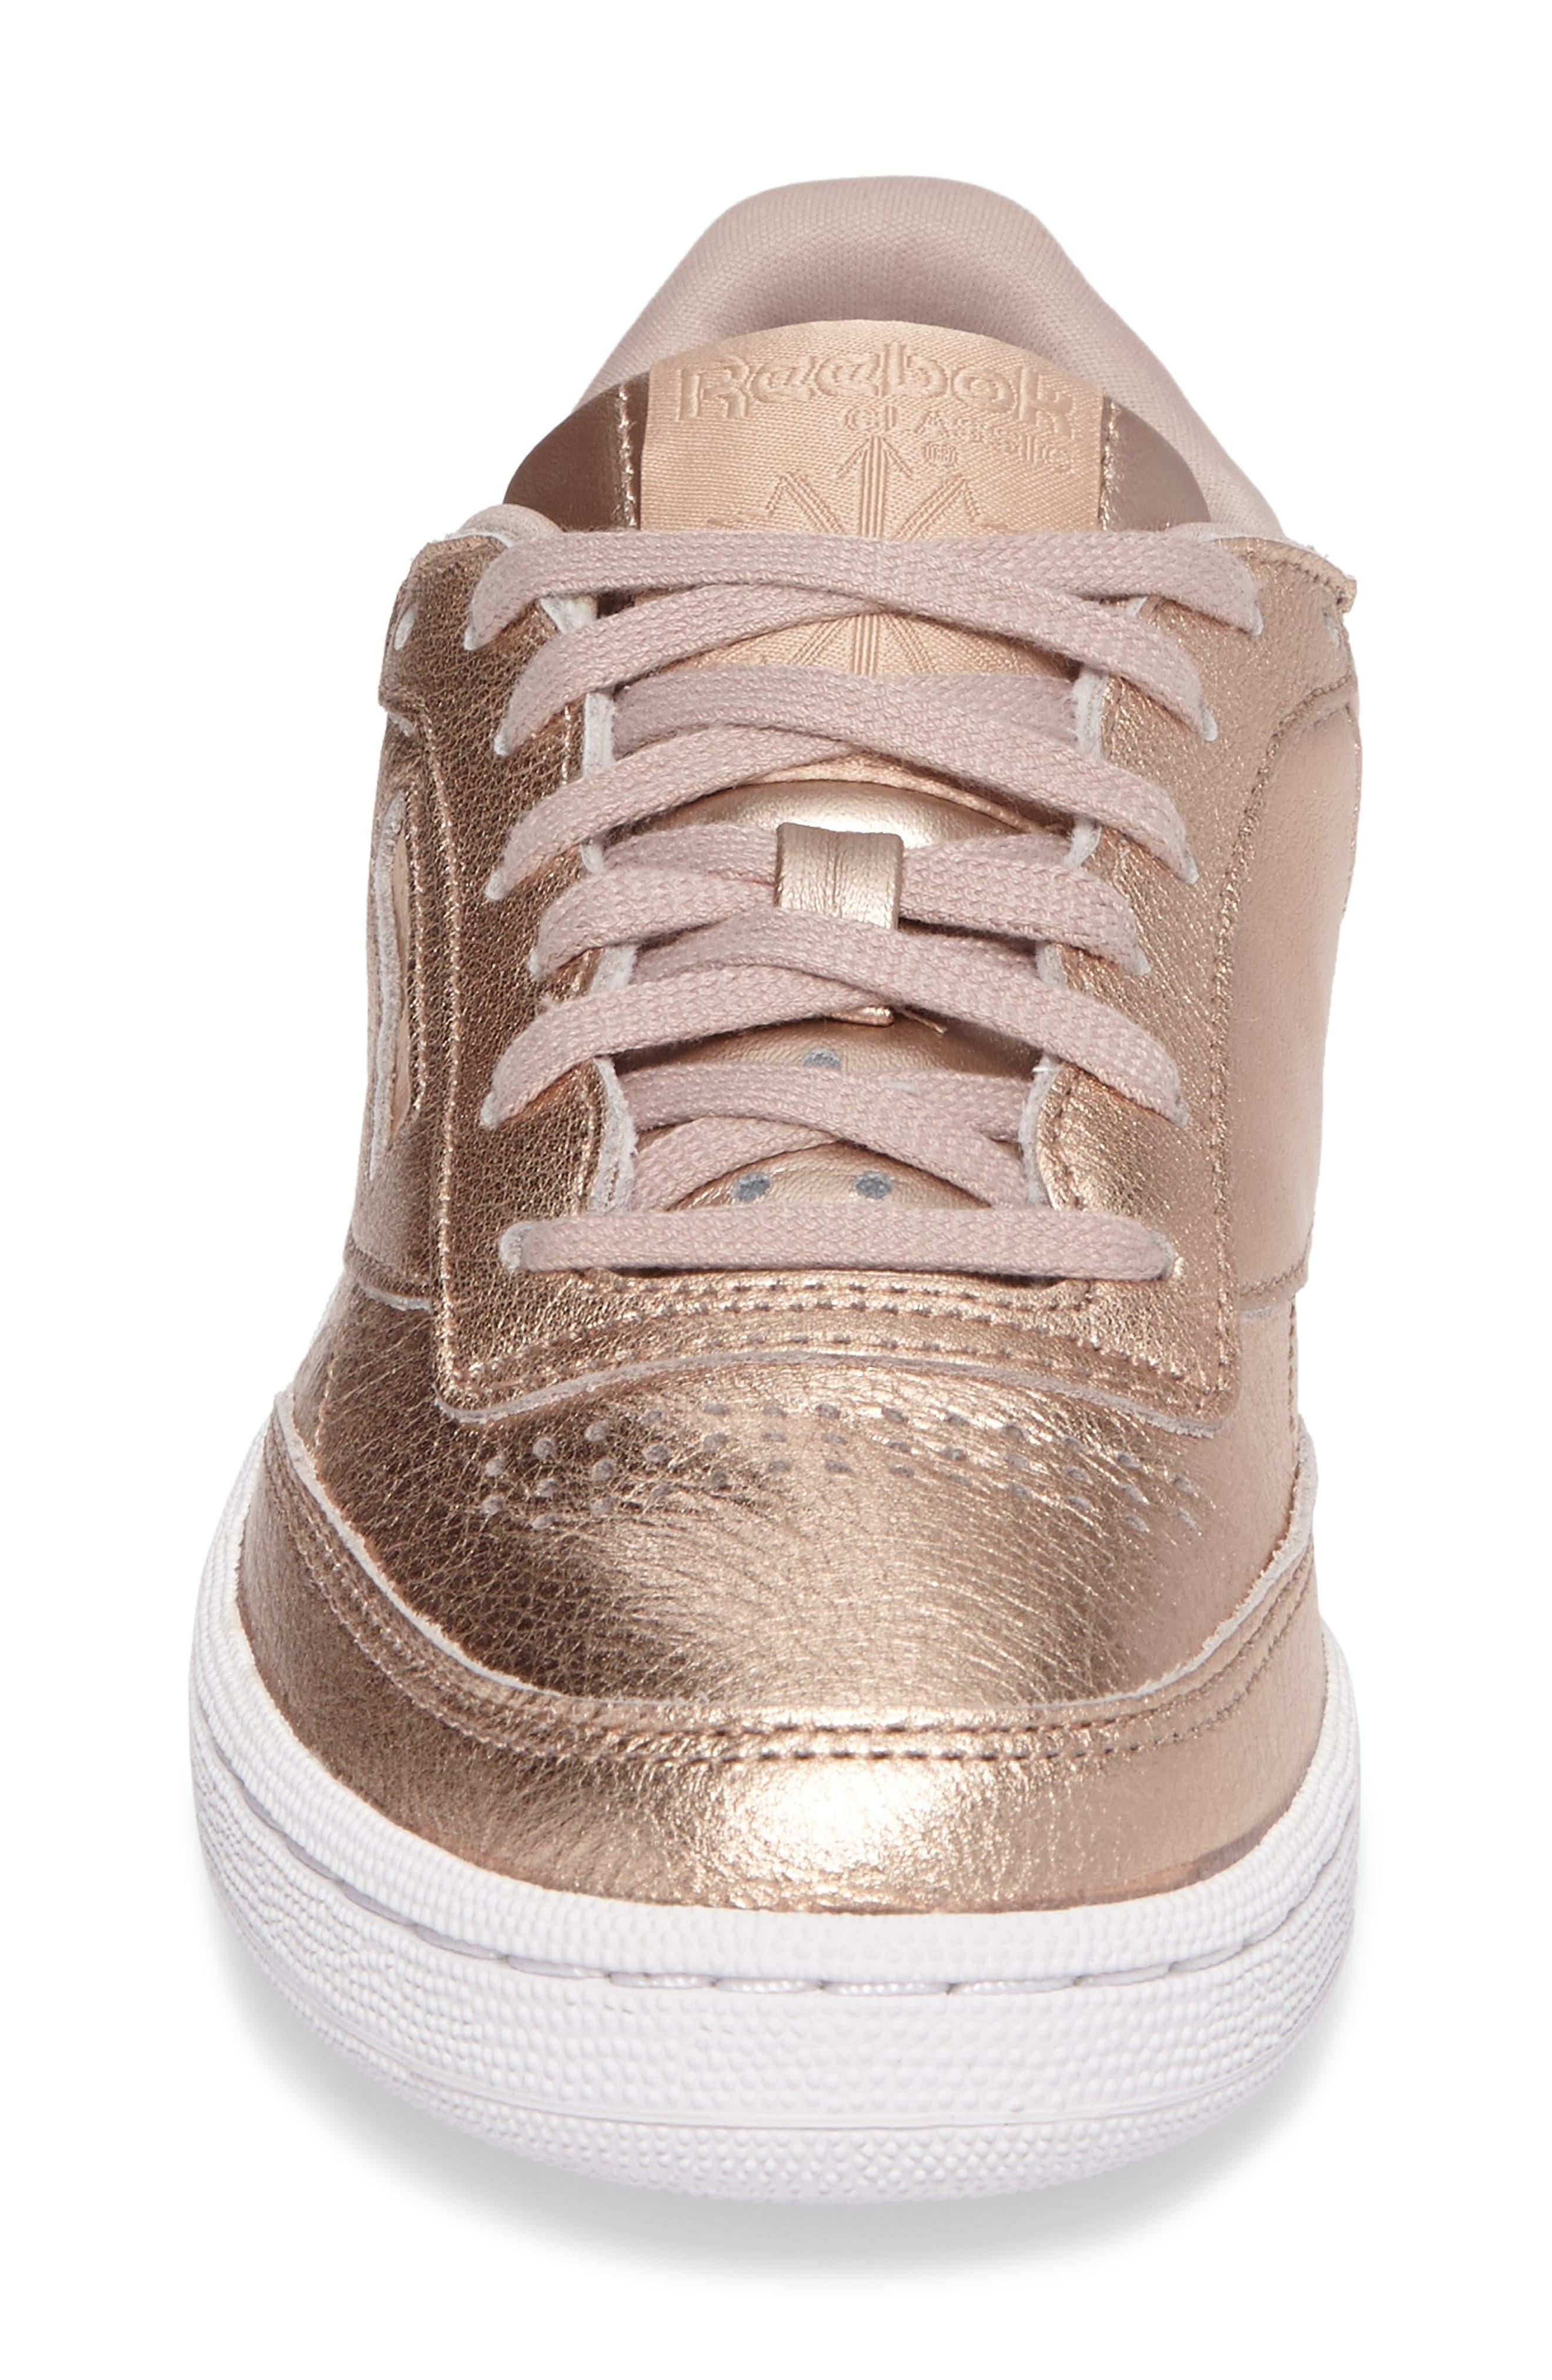 Club C 85 Sneaker,                             Alternate thumbnail 4, color,                             Peach/ White Pearl